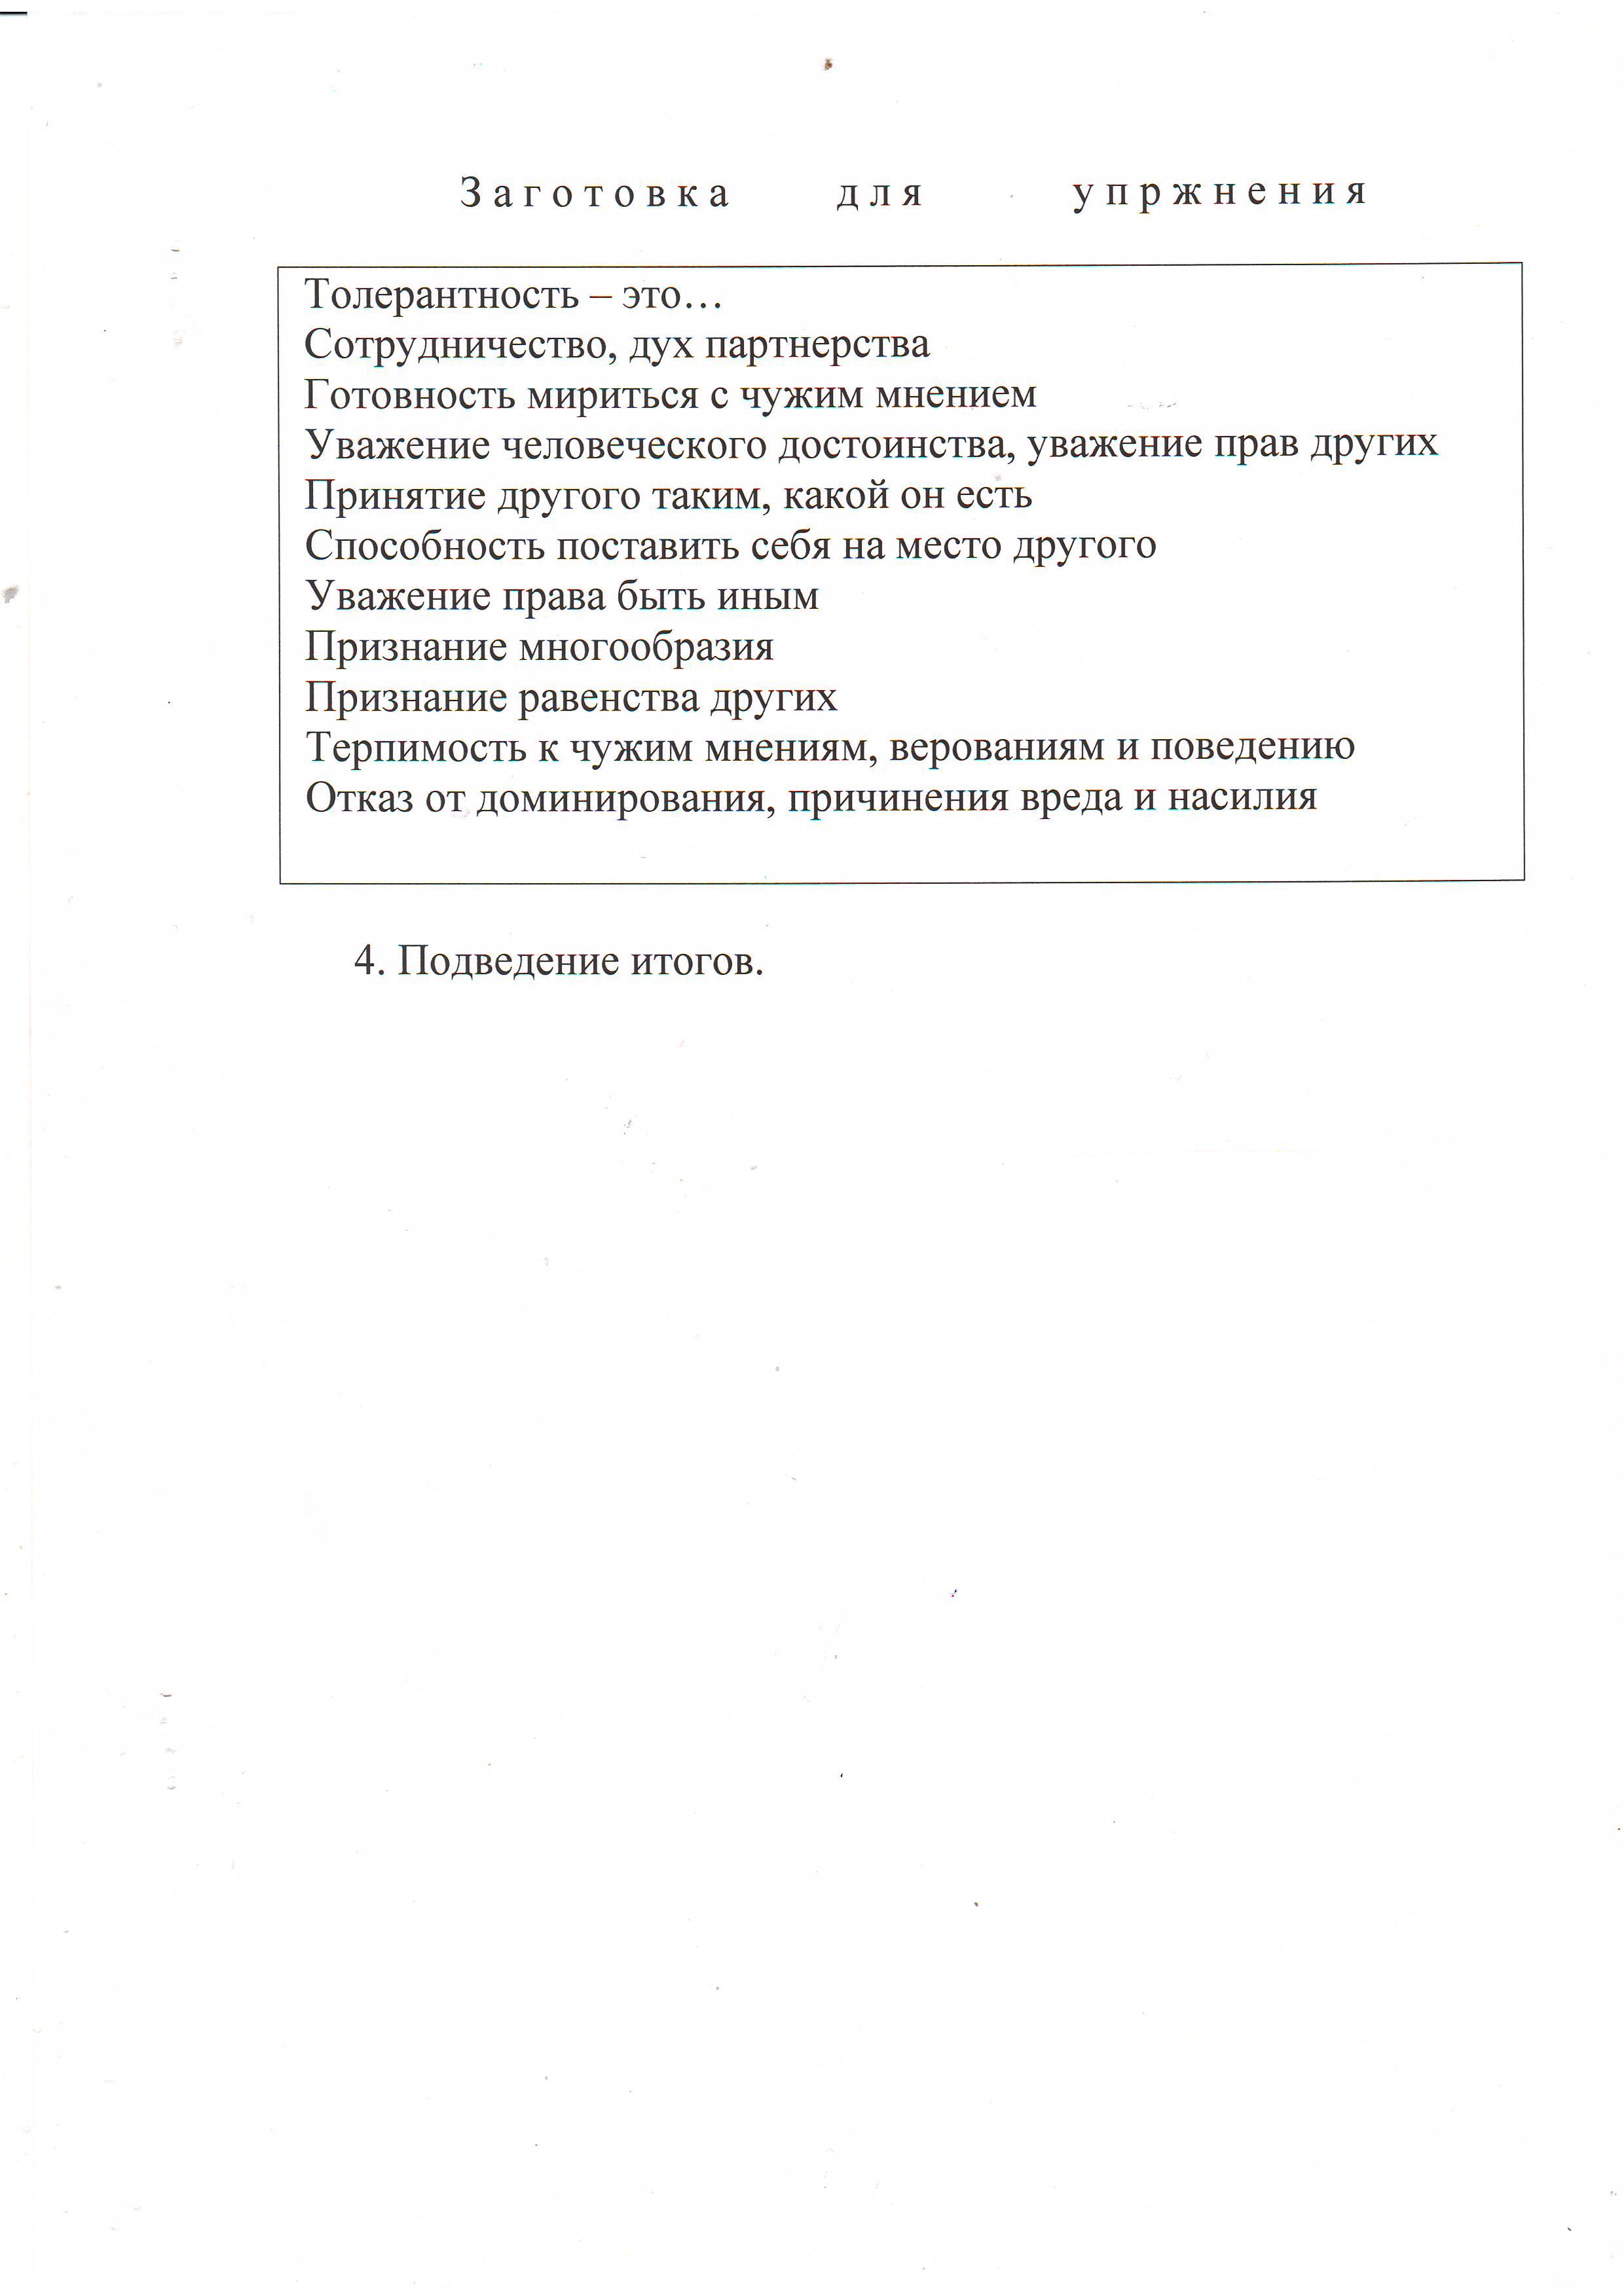 hello_html_5aeb1d36.jpg